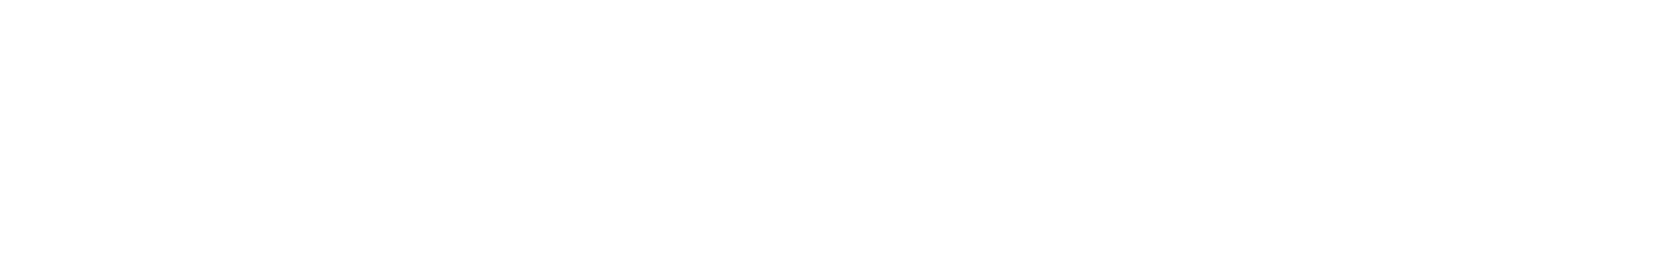 MathType logo